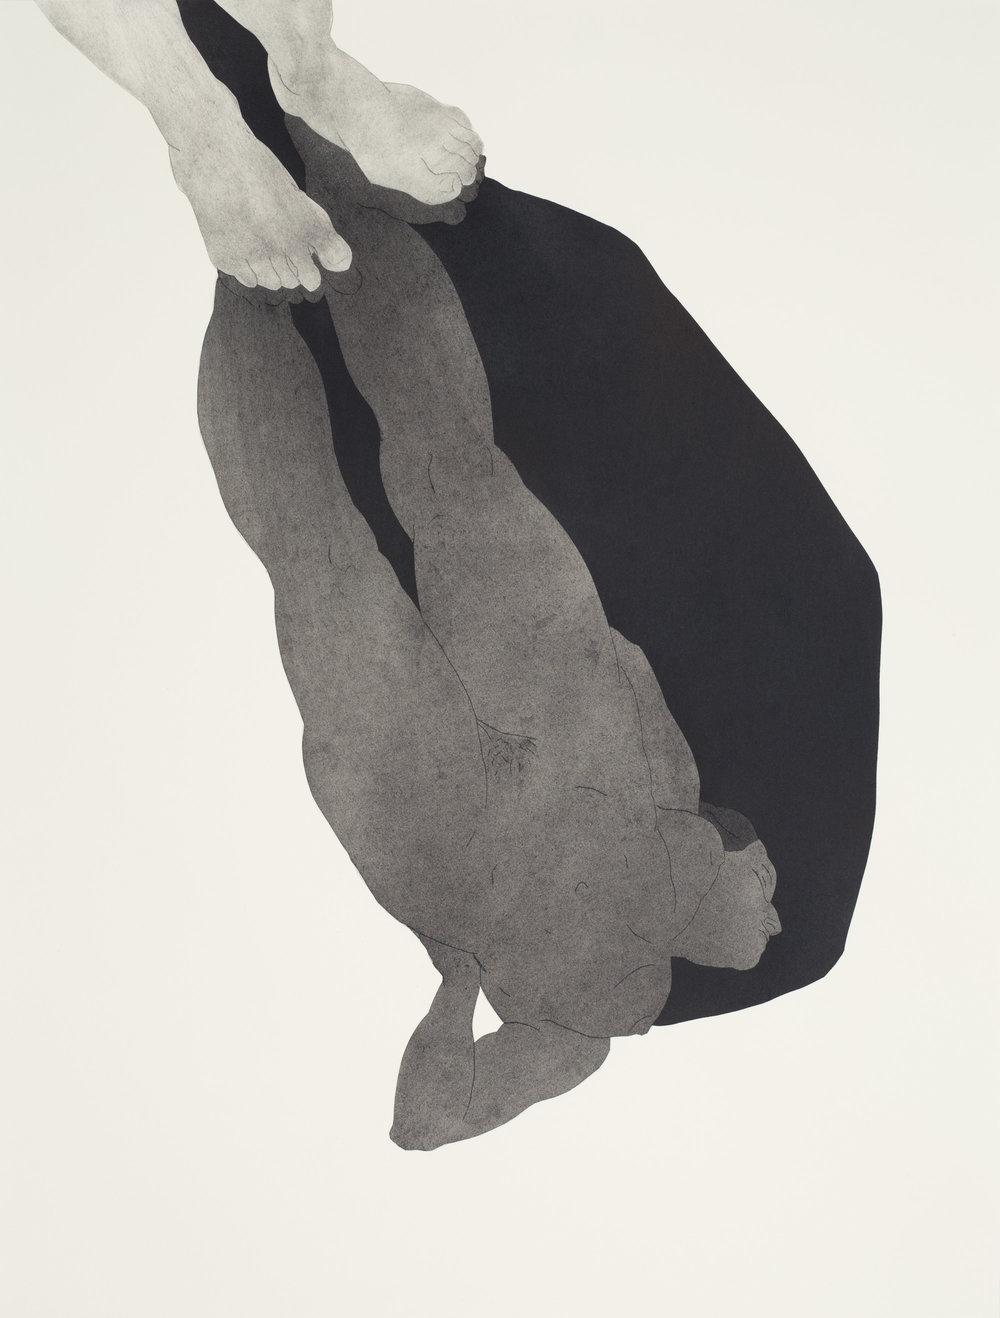 Untitled, 2014. (2014.01.002)